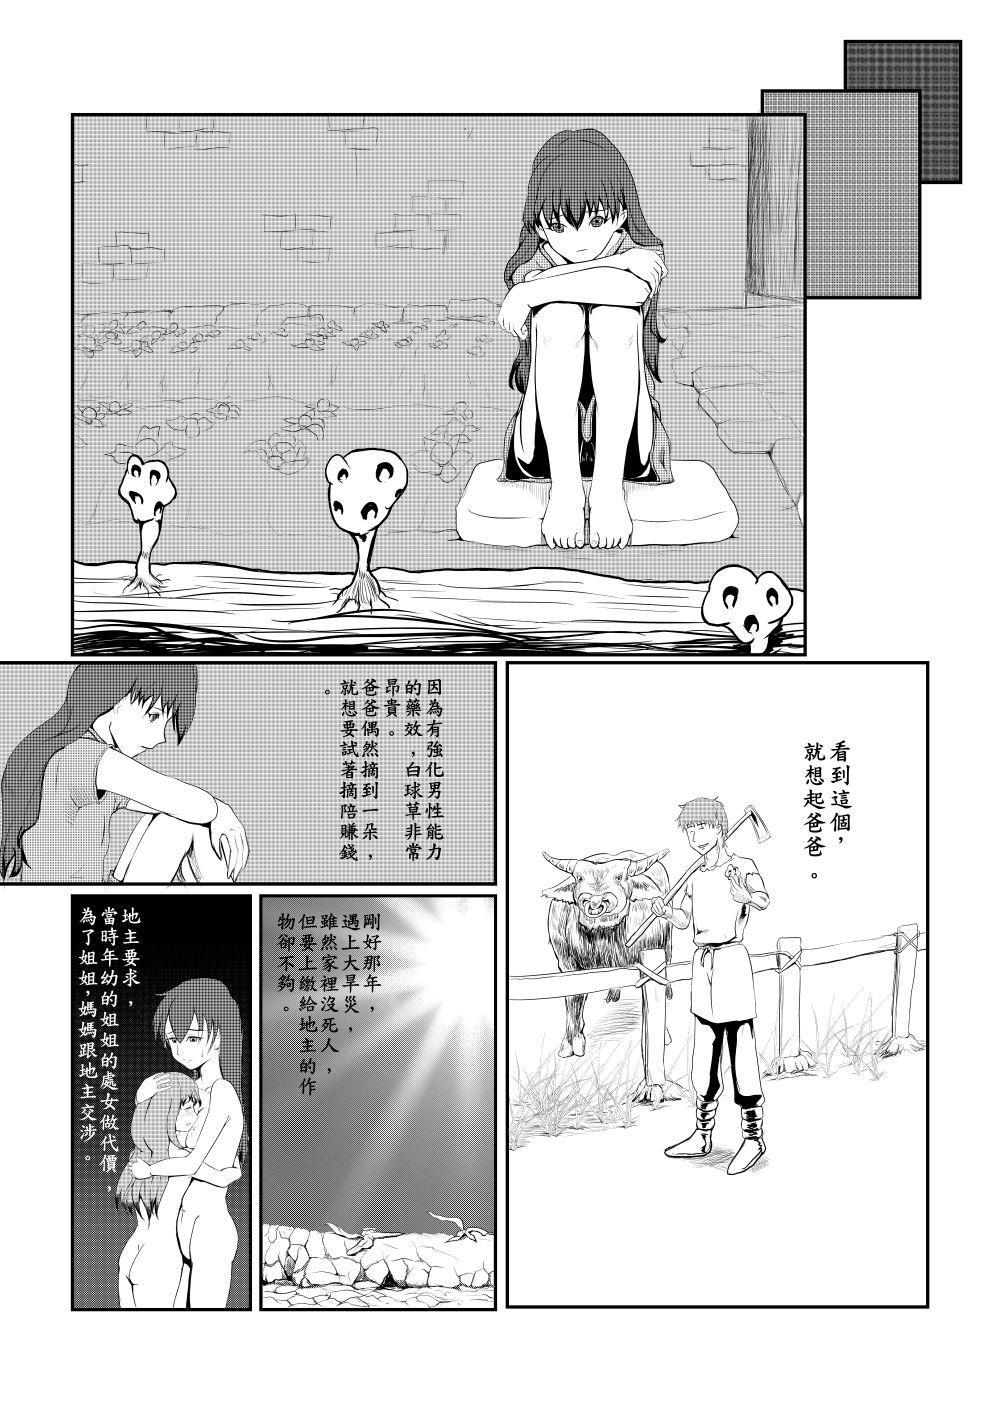 Maou Yuusha - Kachiku Kiki 3 51